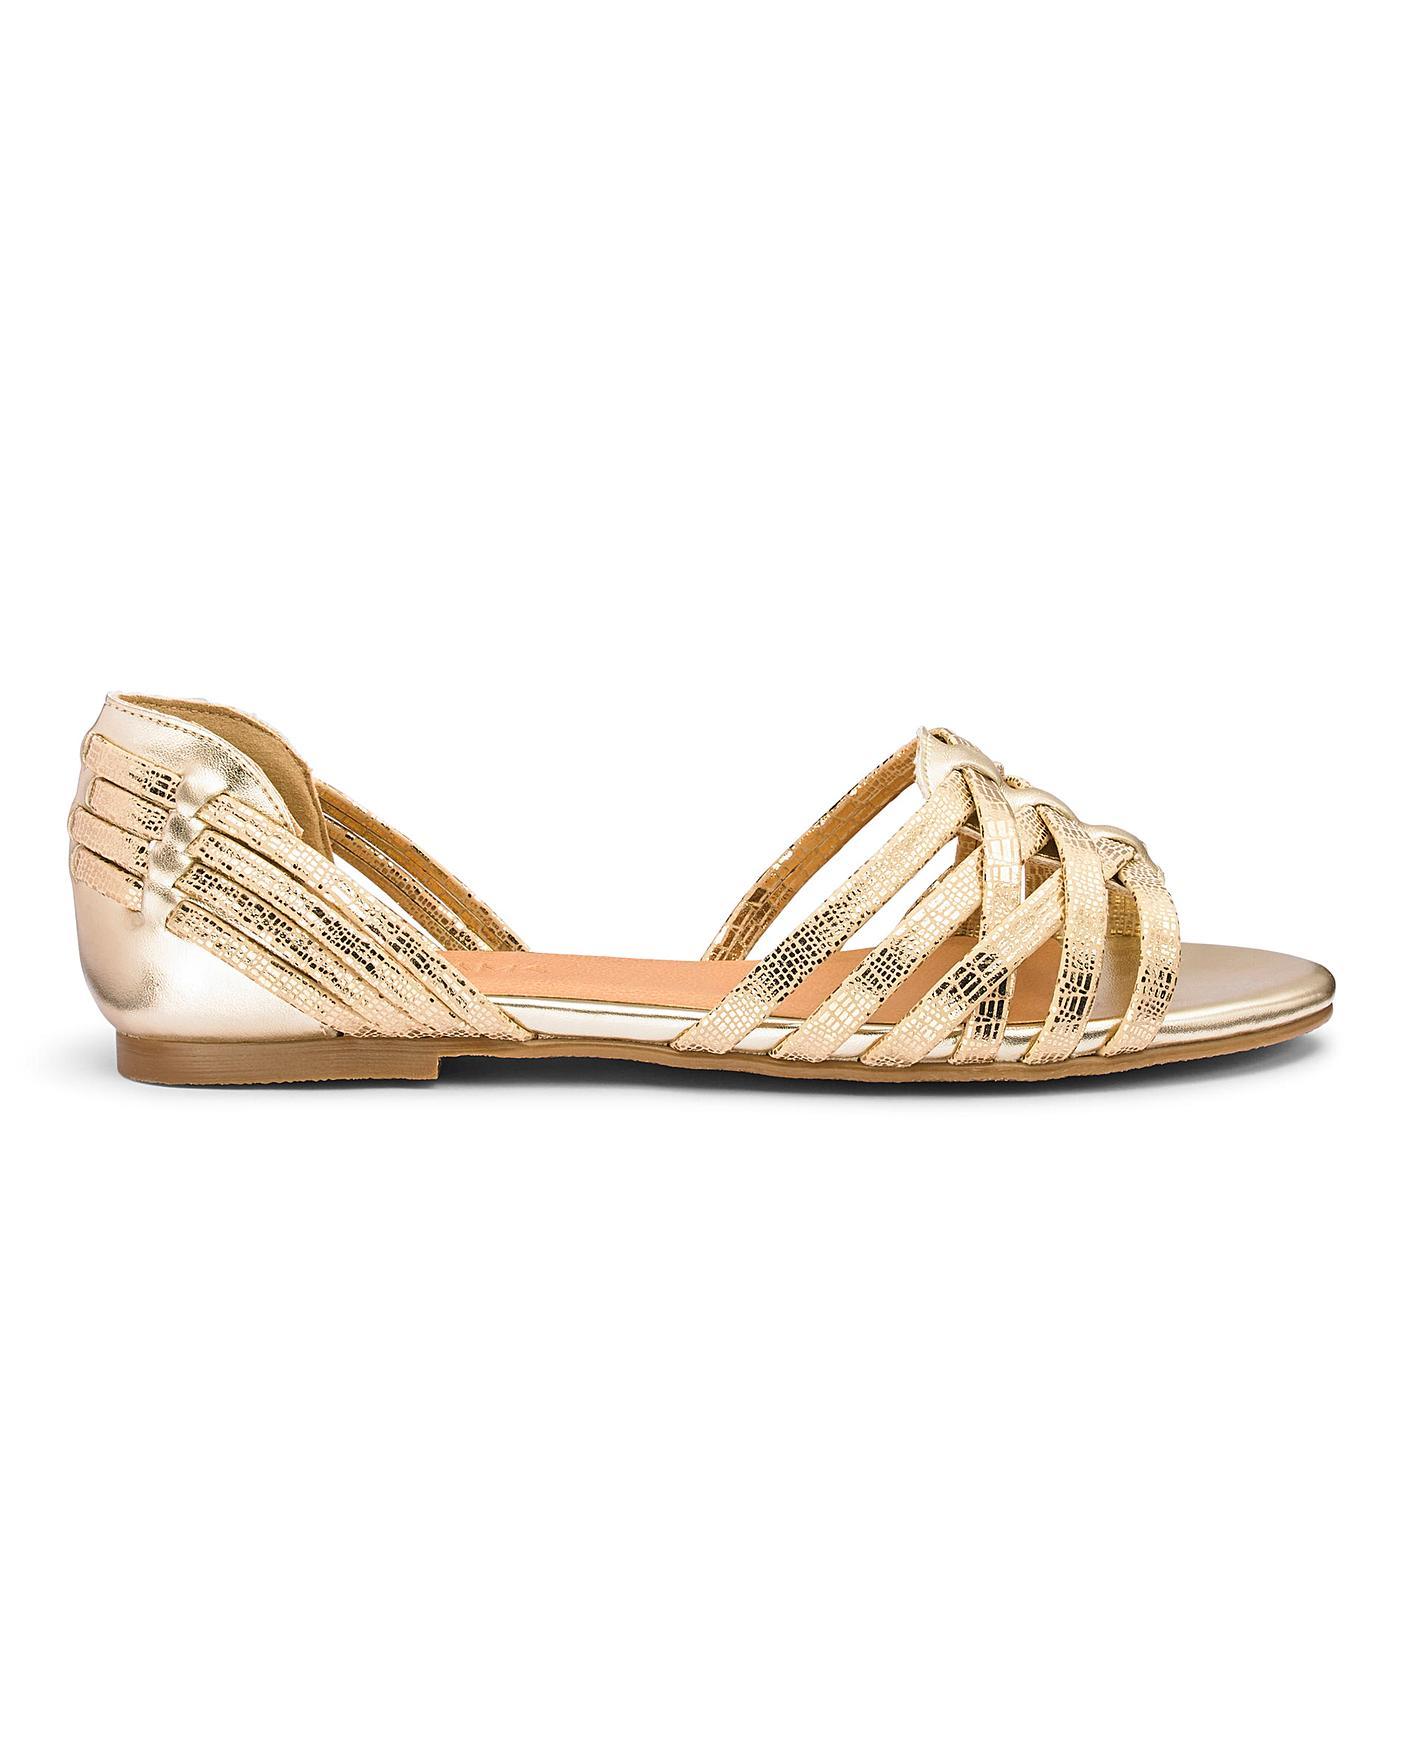 Interweave Open Toe Shoes E Fit   Oxendales